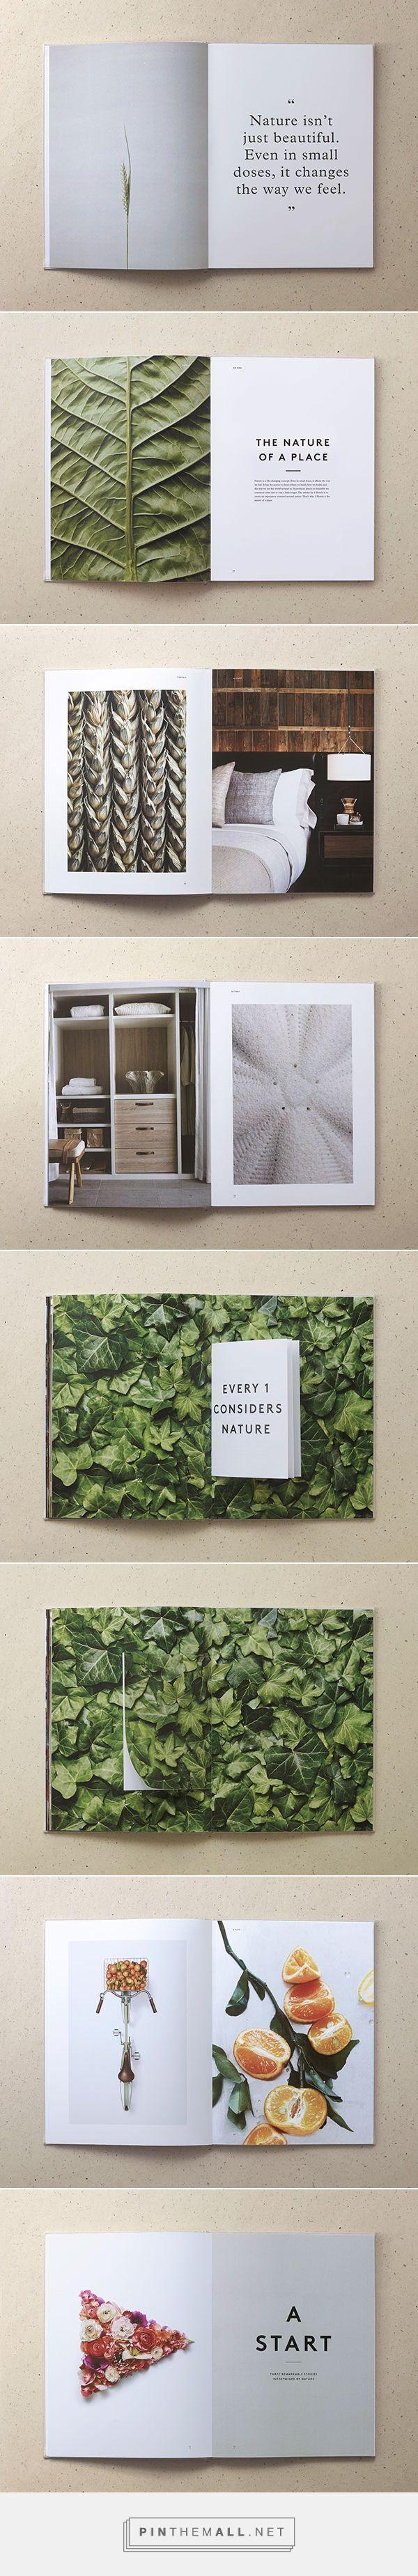 1 Hotels / by Jules Tardy & Christian Cervantes | Brochure, Catalog, Portfolio Design | Pinterest